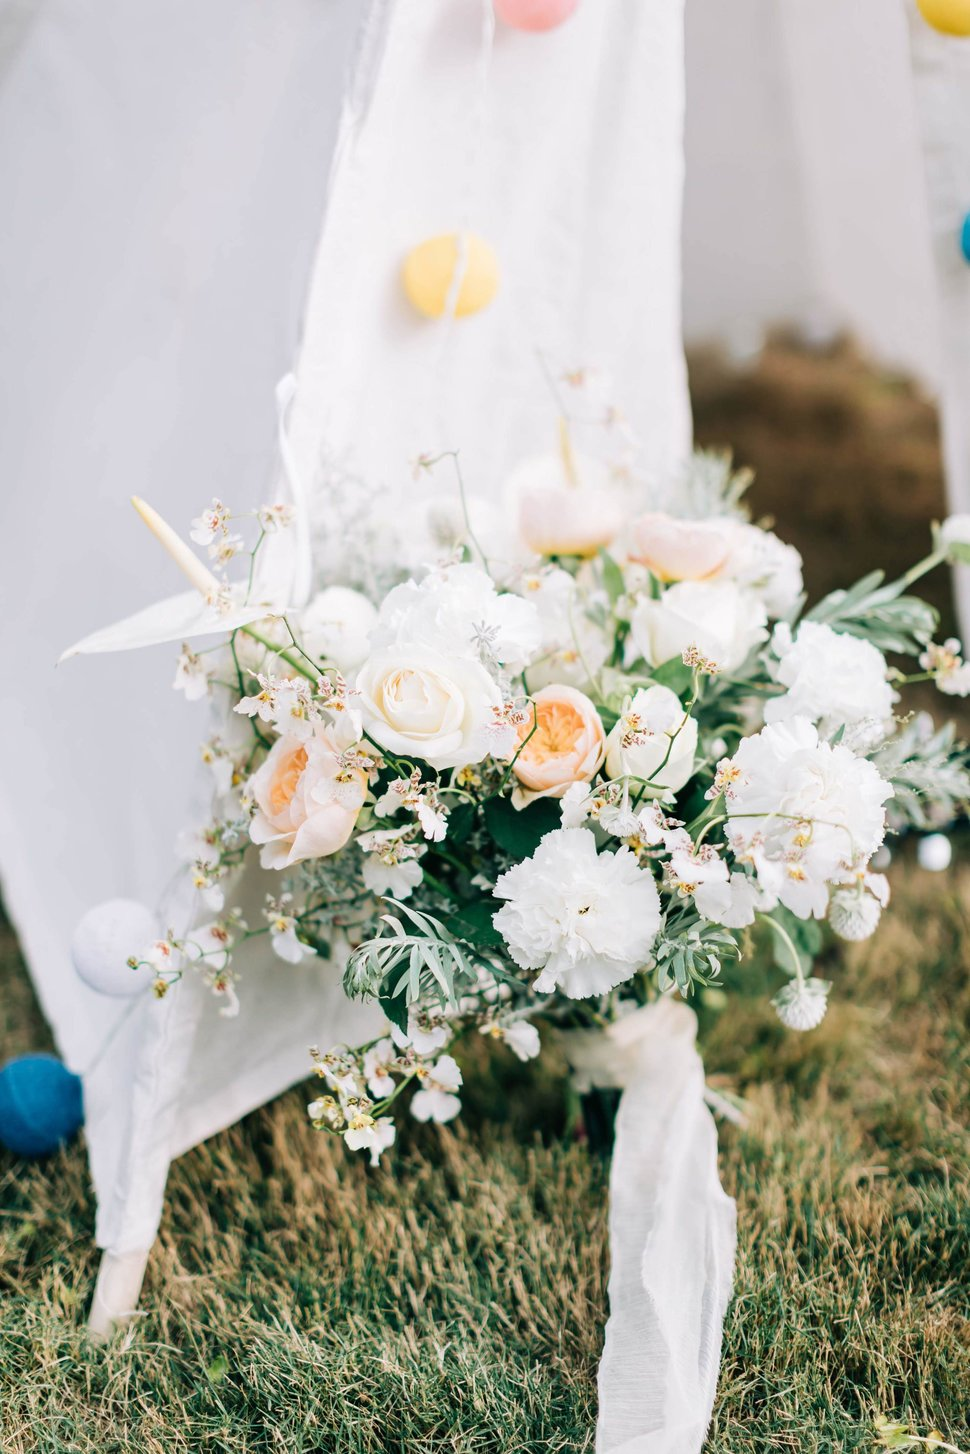 AG3_7100 - Cradle Wedding搖籃手工婚紗《結婚吧》